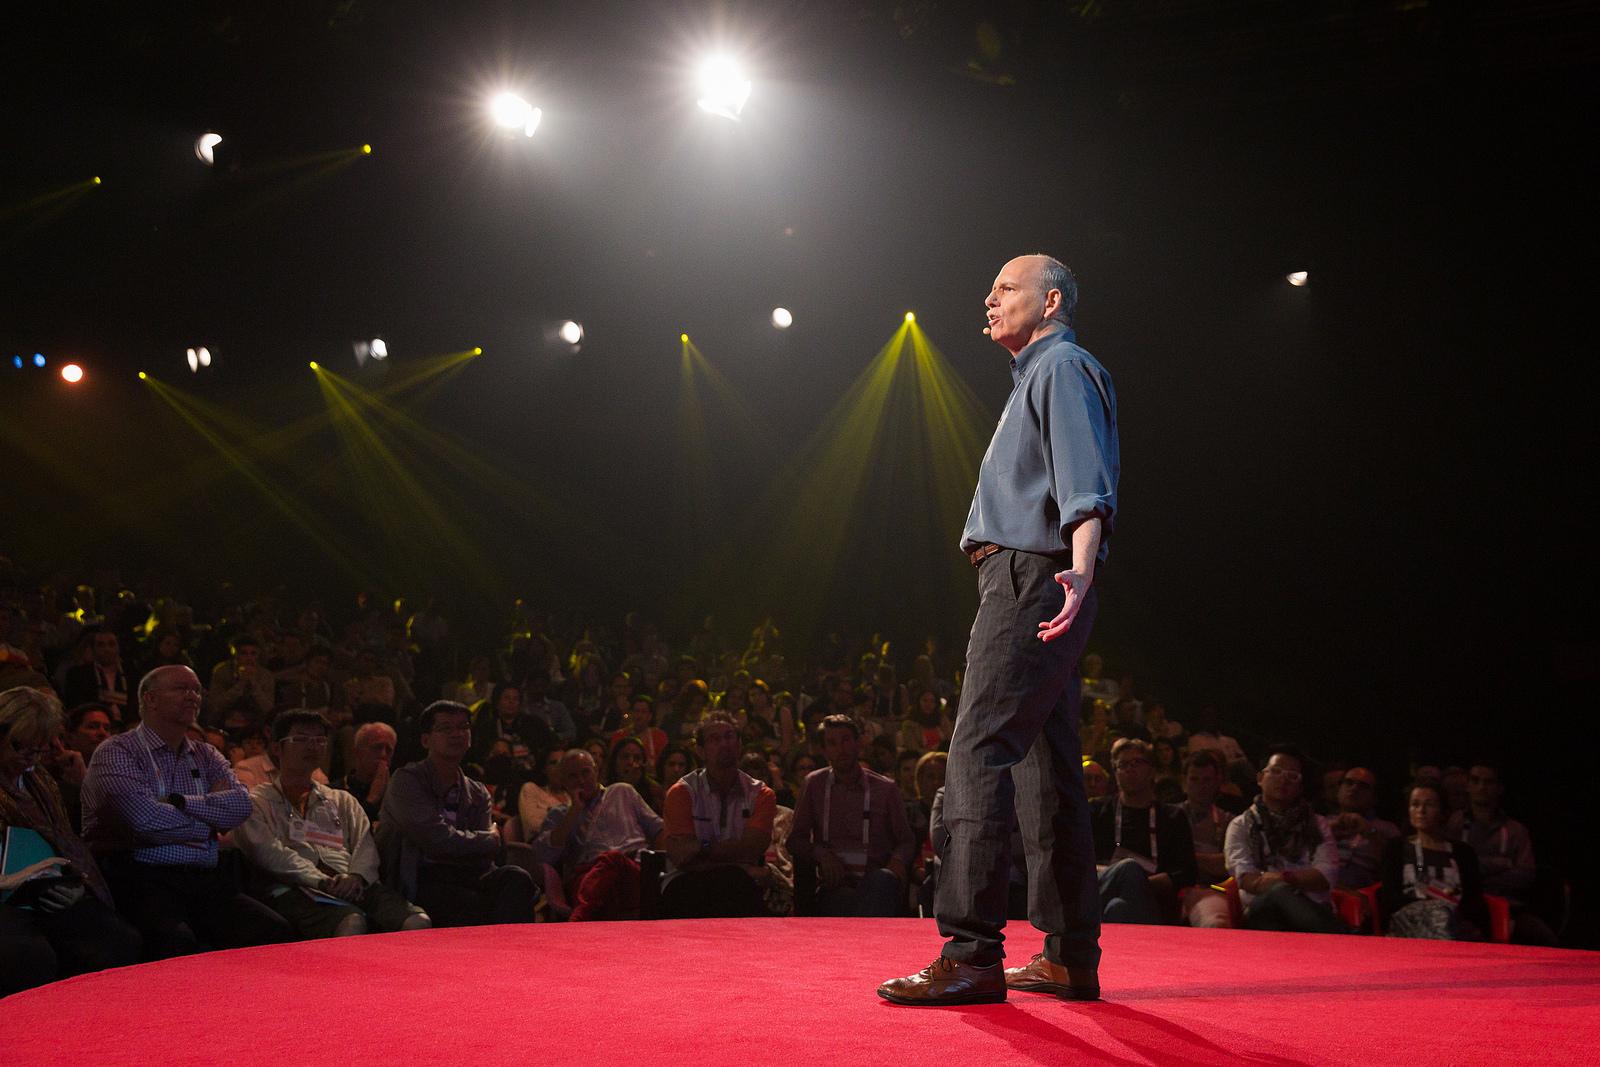 Ethan Nadelelmann speaks at TEDGlobal 2014. Photo: James Duncan Davidson/TED